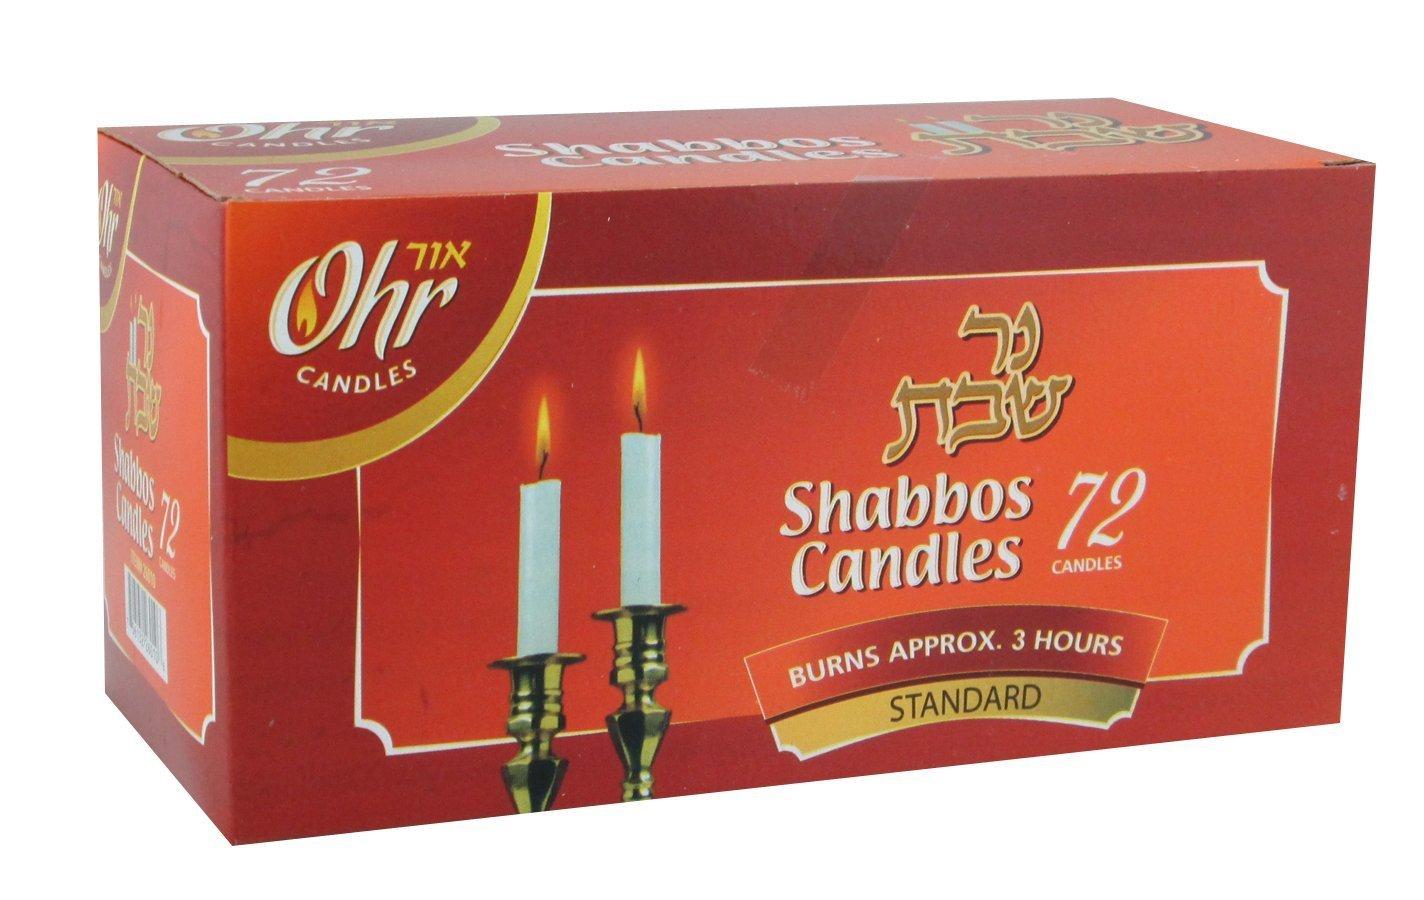 "Lot 72 Manischewitz Paraffin 4/"" Shabbos Emergency Camping Storm 3 Hour Candles"